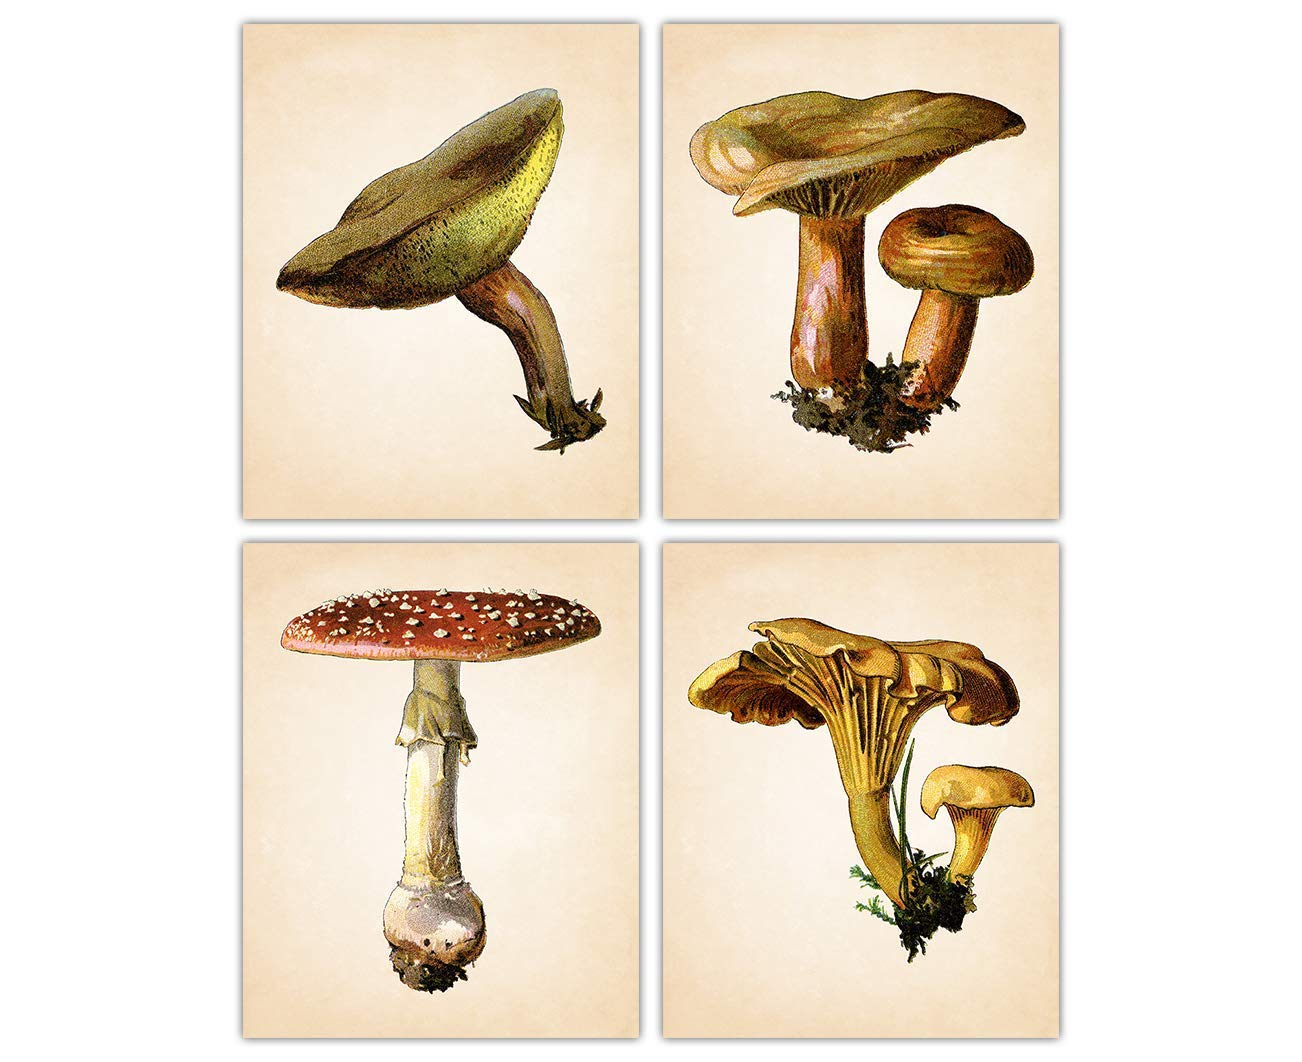 Vintage Mushrooms Wall Art Prints - Set of Four (8x10) Photos Unframed Make Great Room Wall Decor Gift Idea Under $20